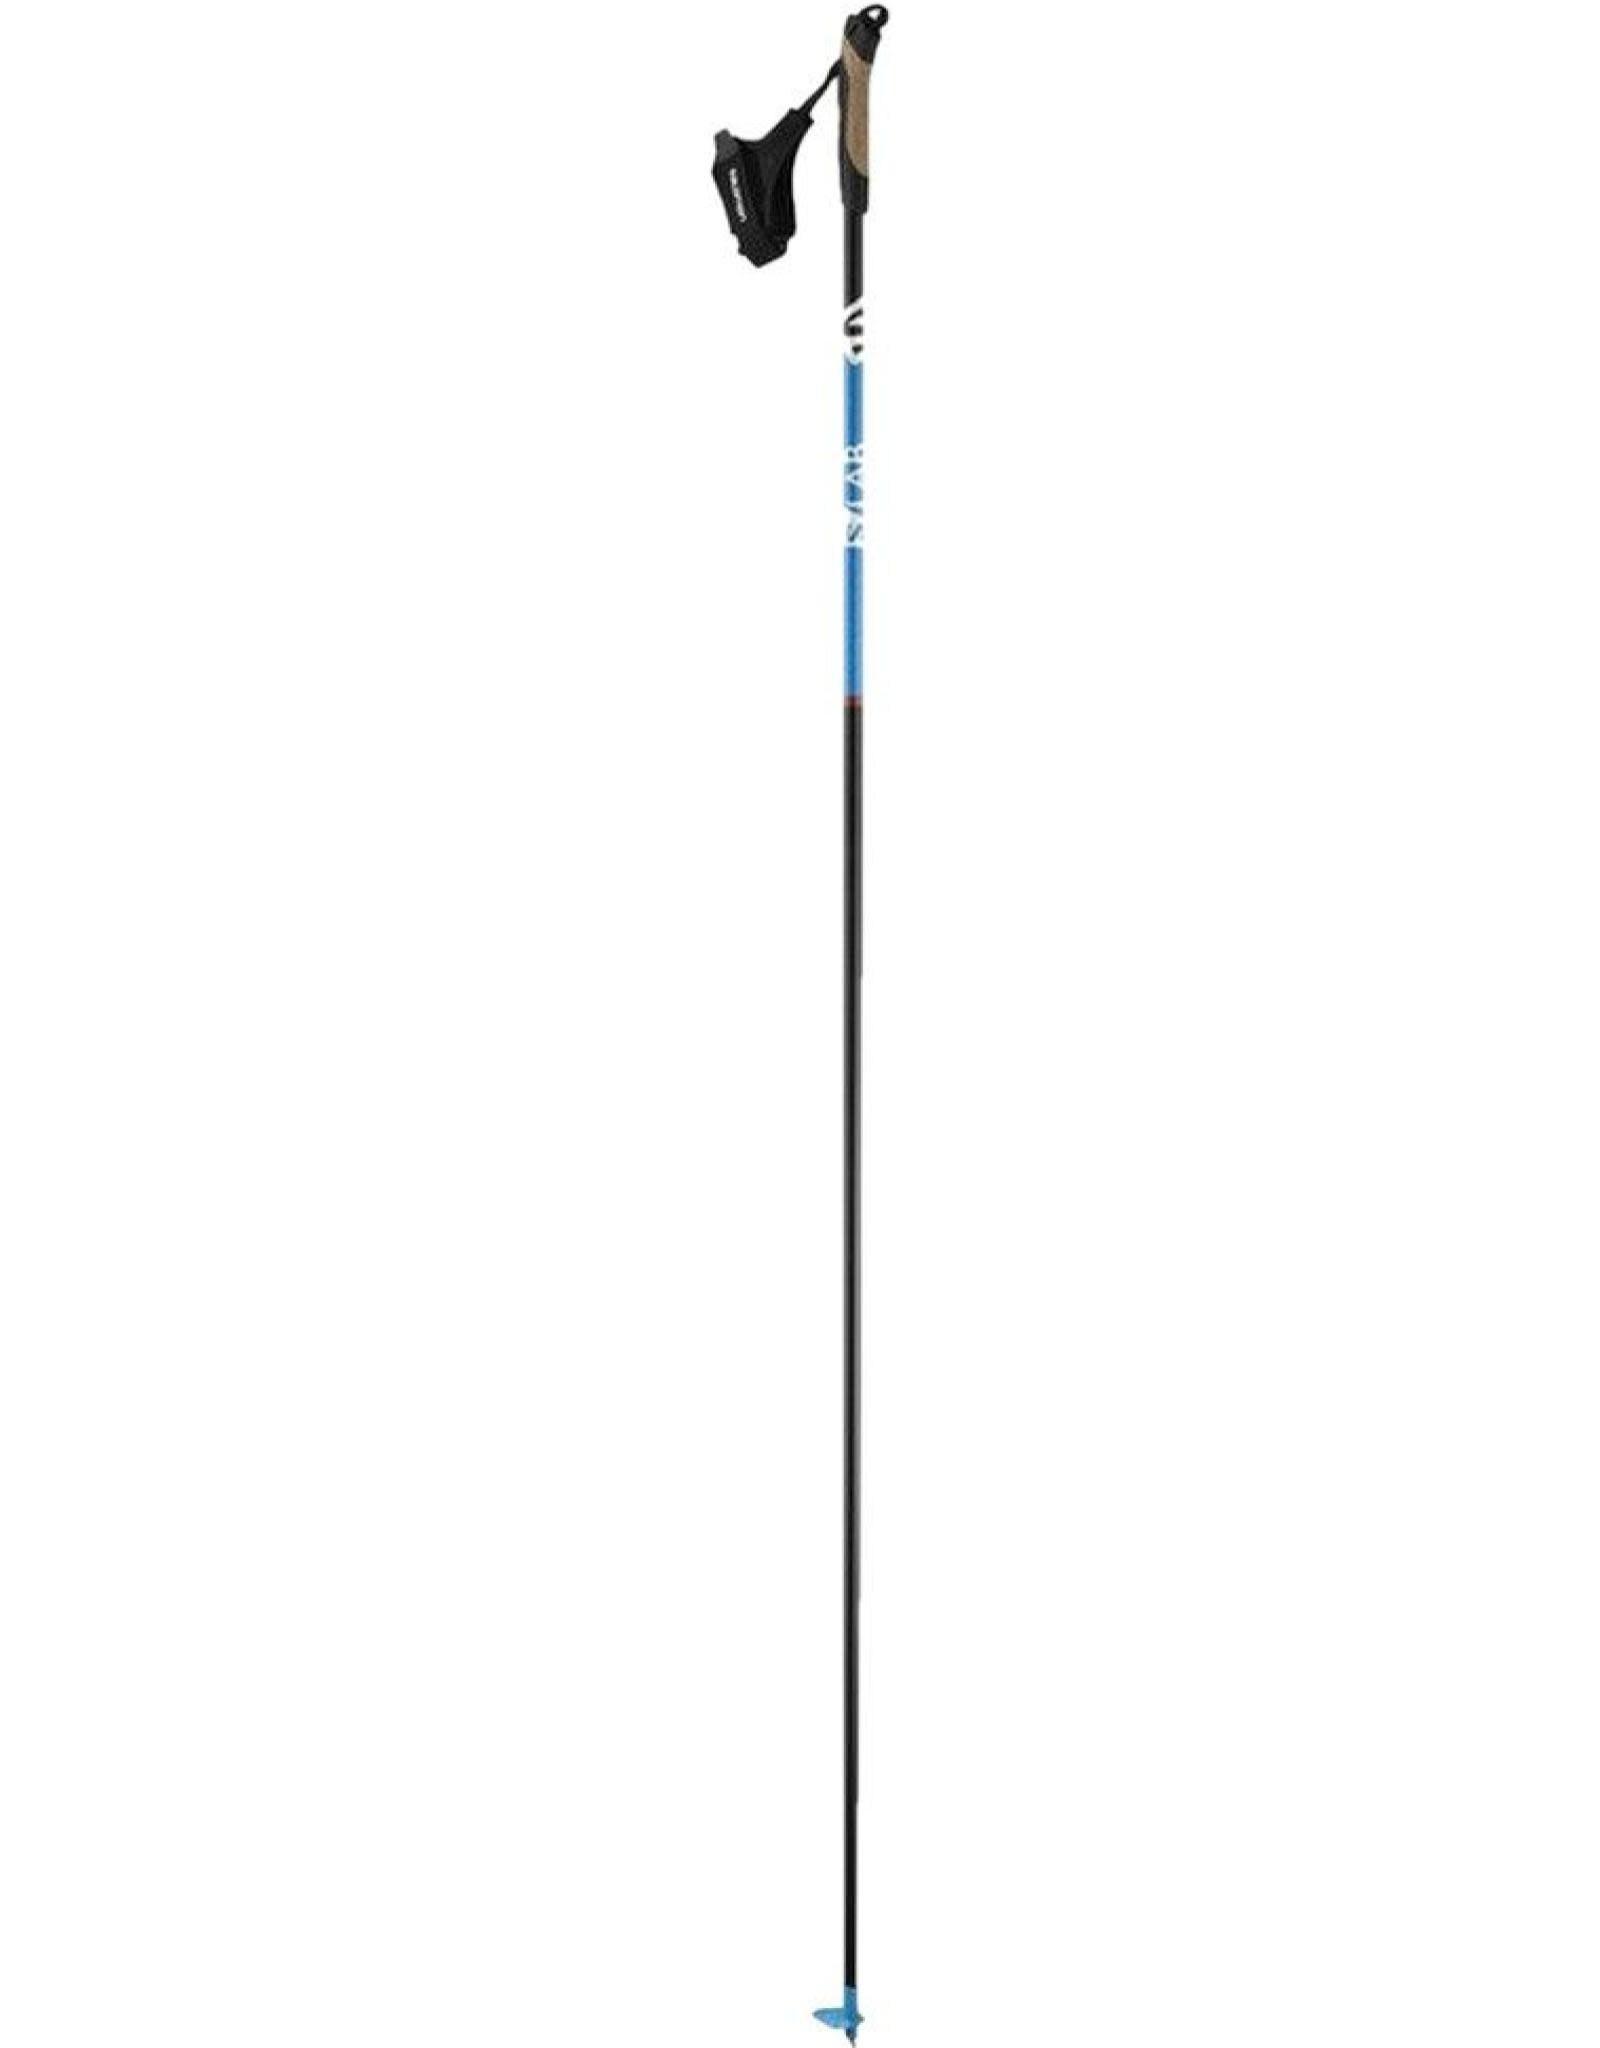 Salomon Salomon S-LAB Carbon Pole